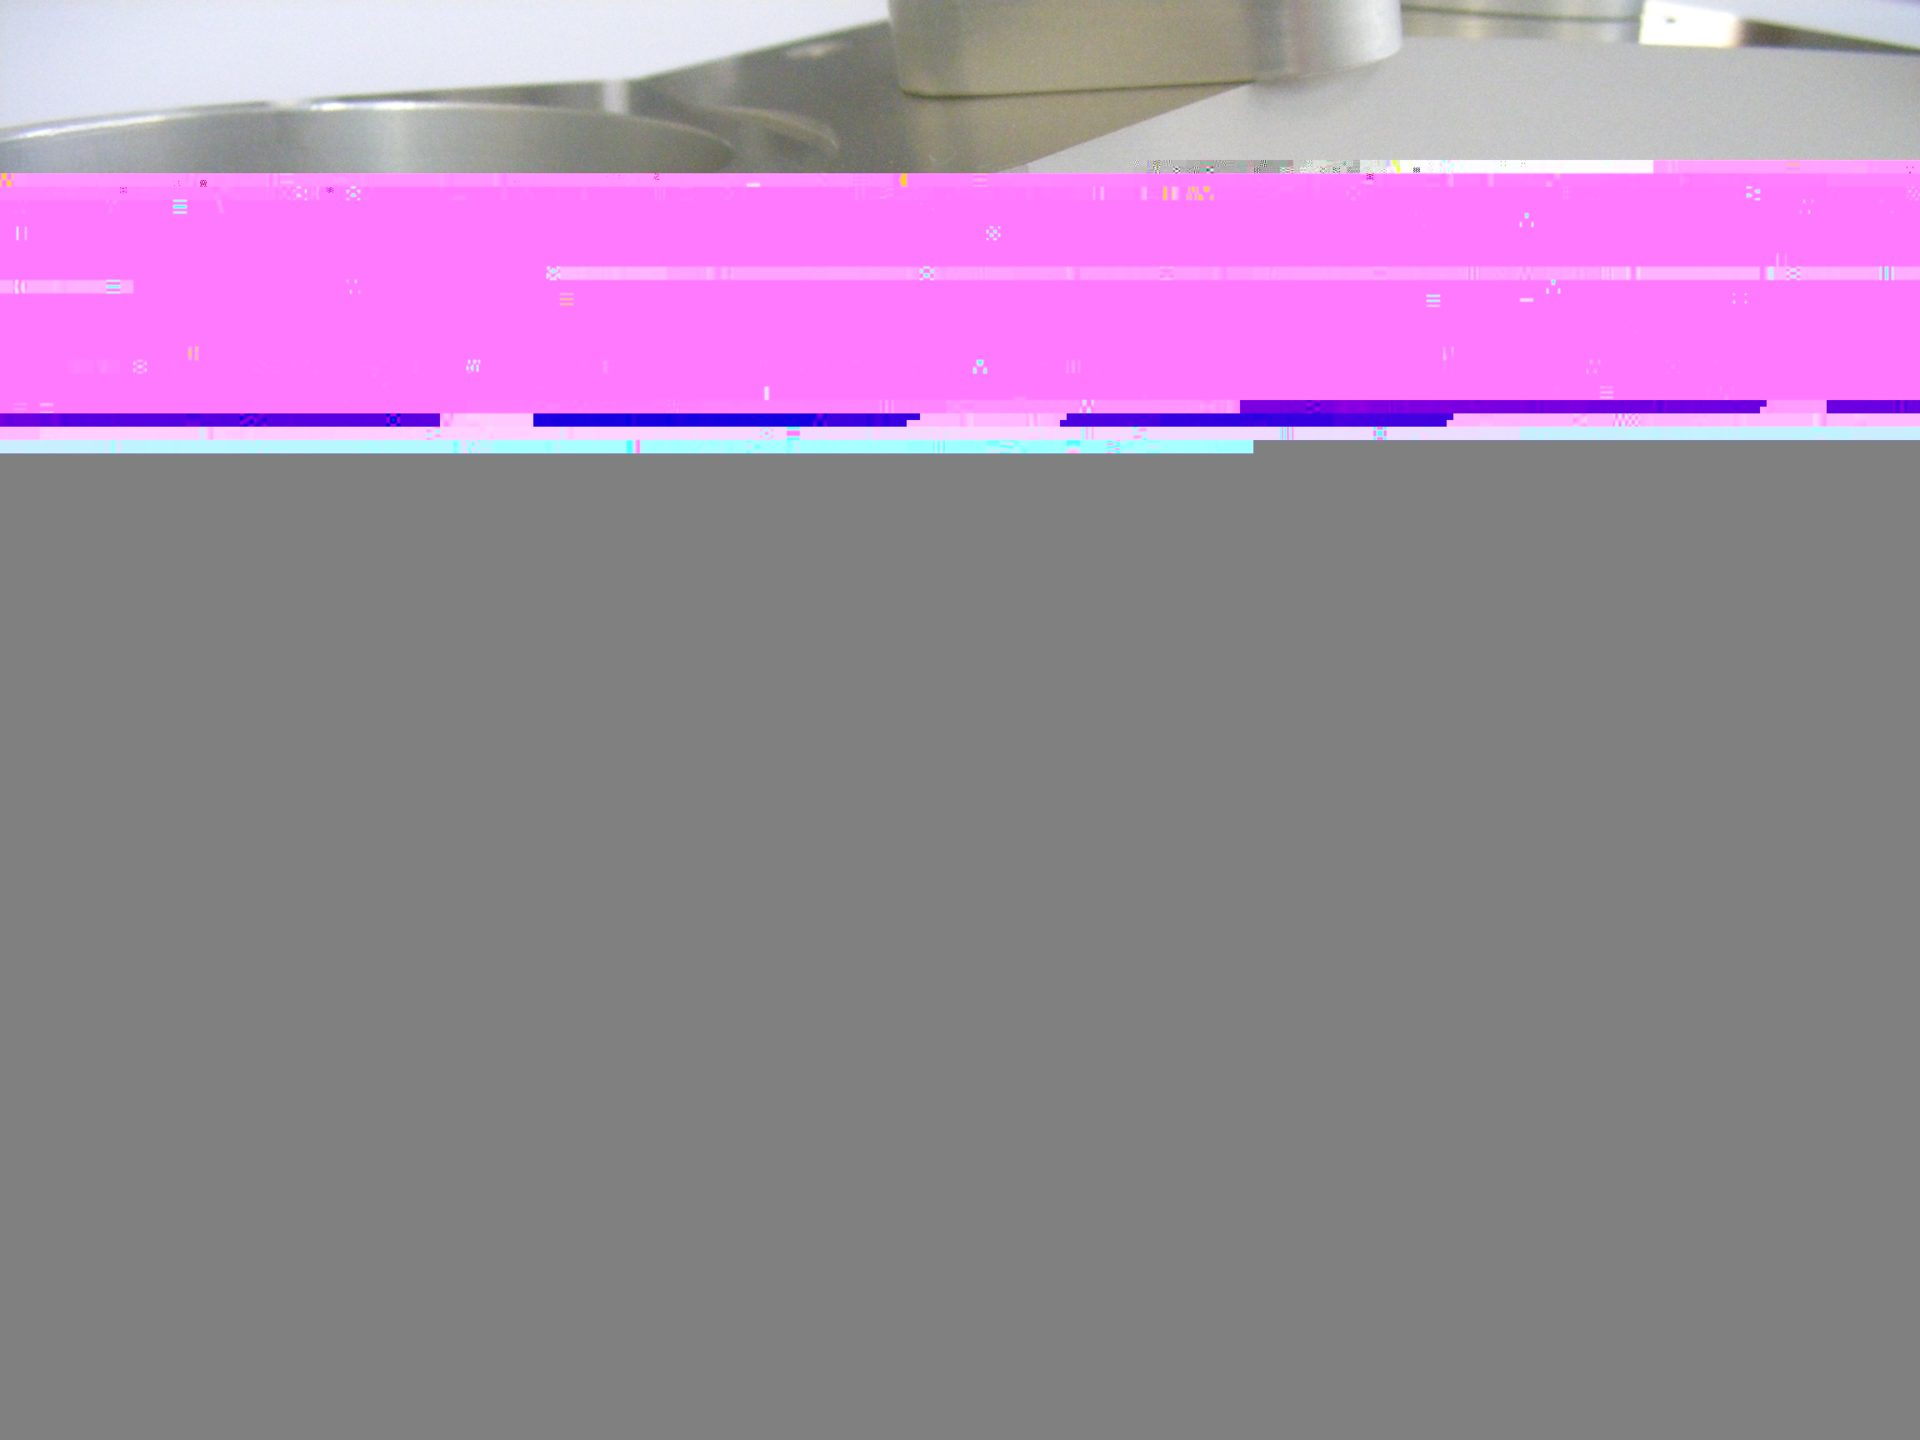 Piastre sterzo S1000RR 2020 k67